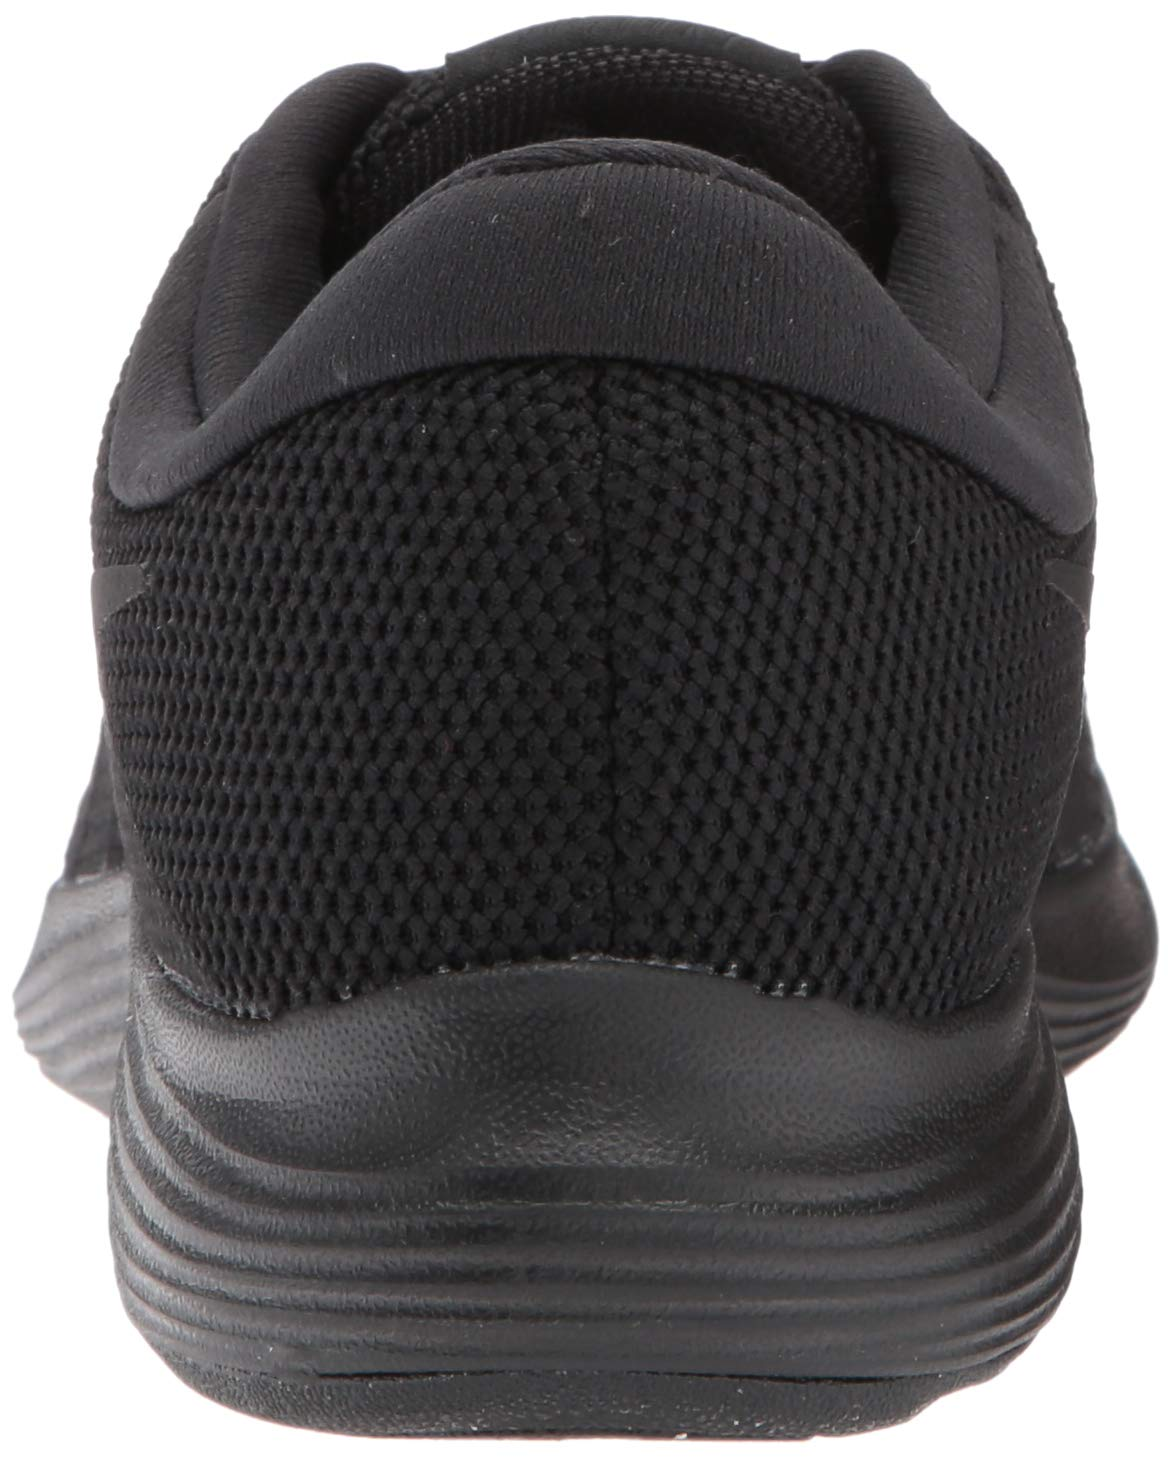 Nike Men's Revolution 4 Running Shoe, Black/White-Anthracite, 7 Regular US by Nike (Image #2)